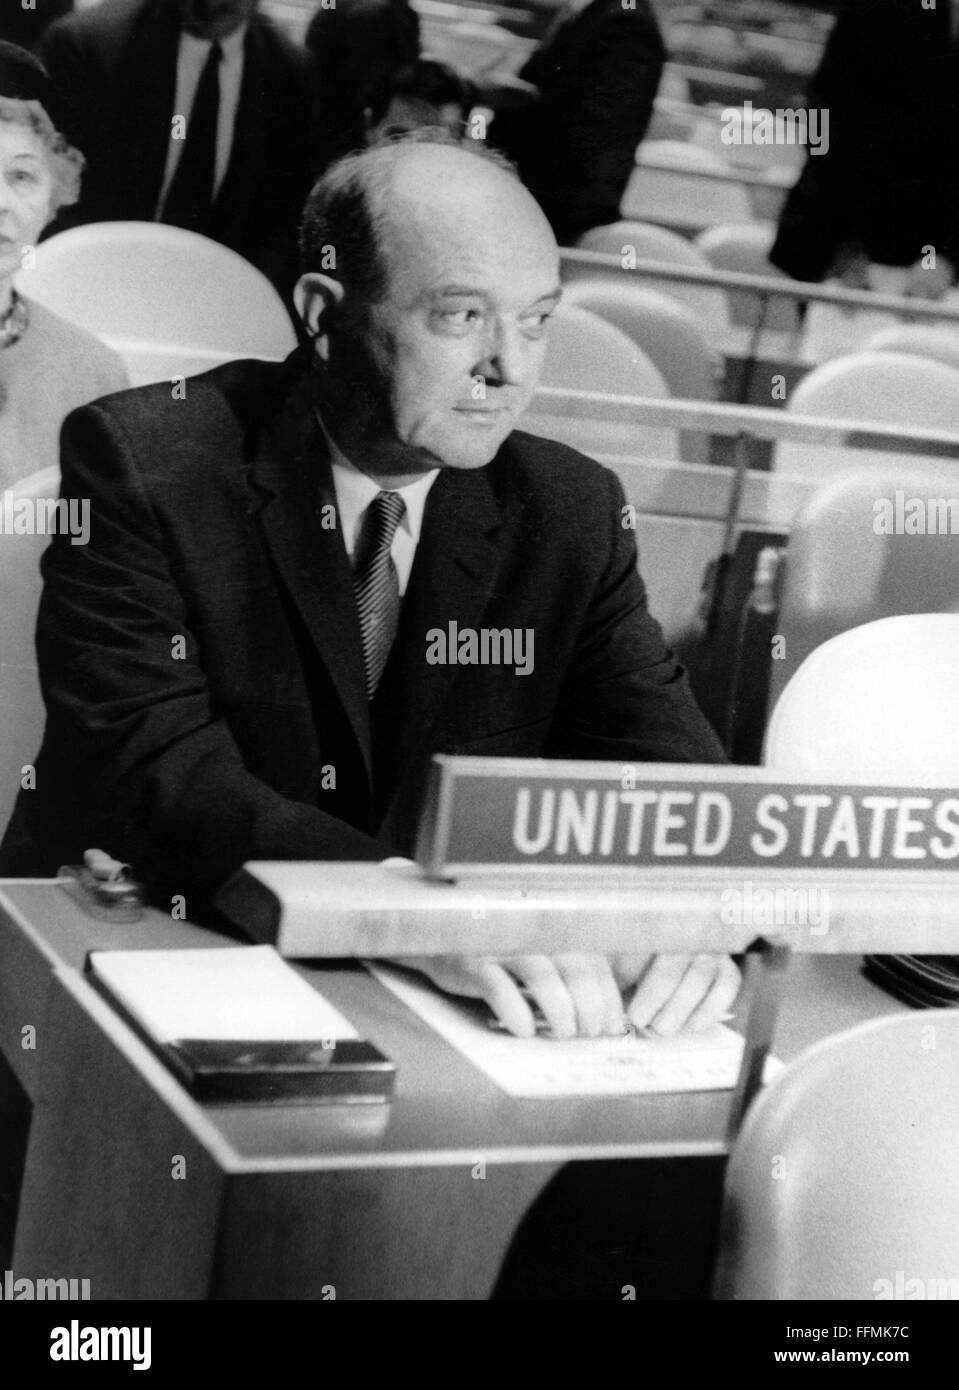 Rusk, Dean, 9.2.1909 - 20.12.1994, American politician (Democrats), Unites States Secretary of State 21.1.1961  - Stock Image